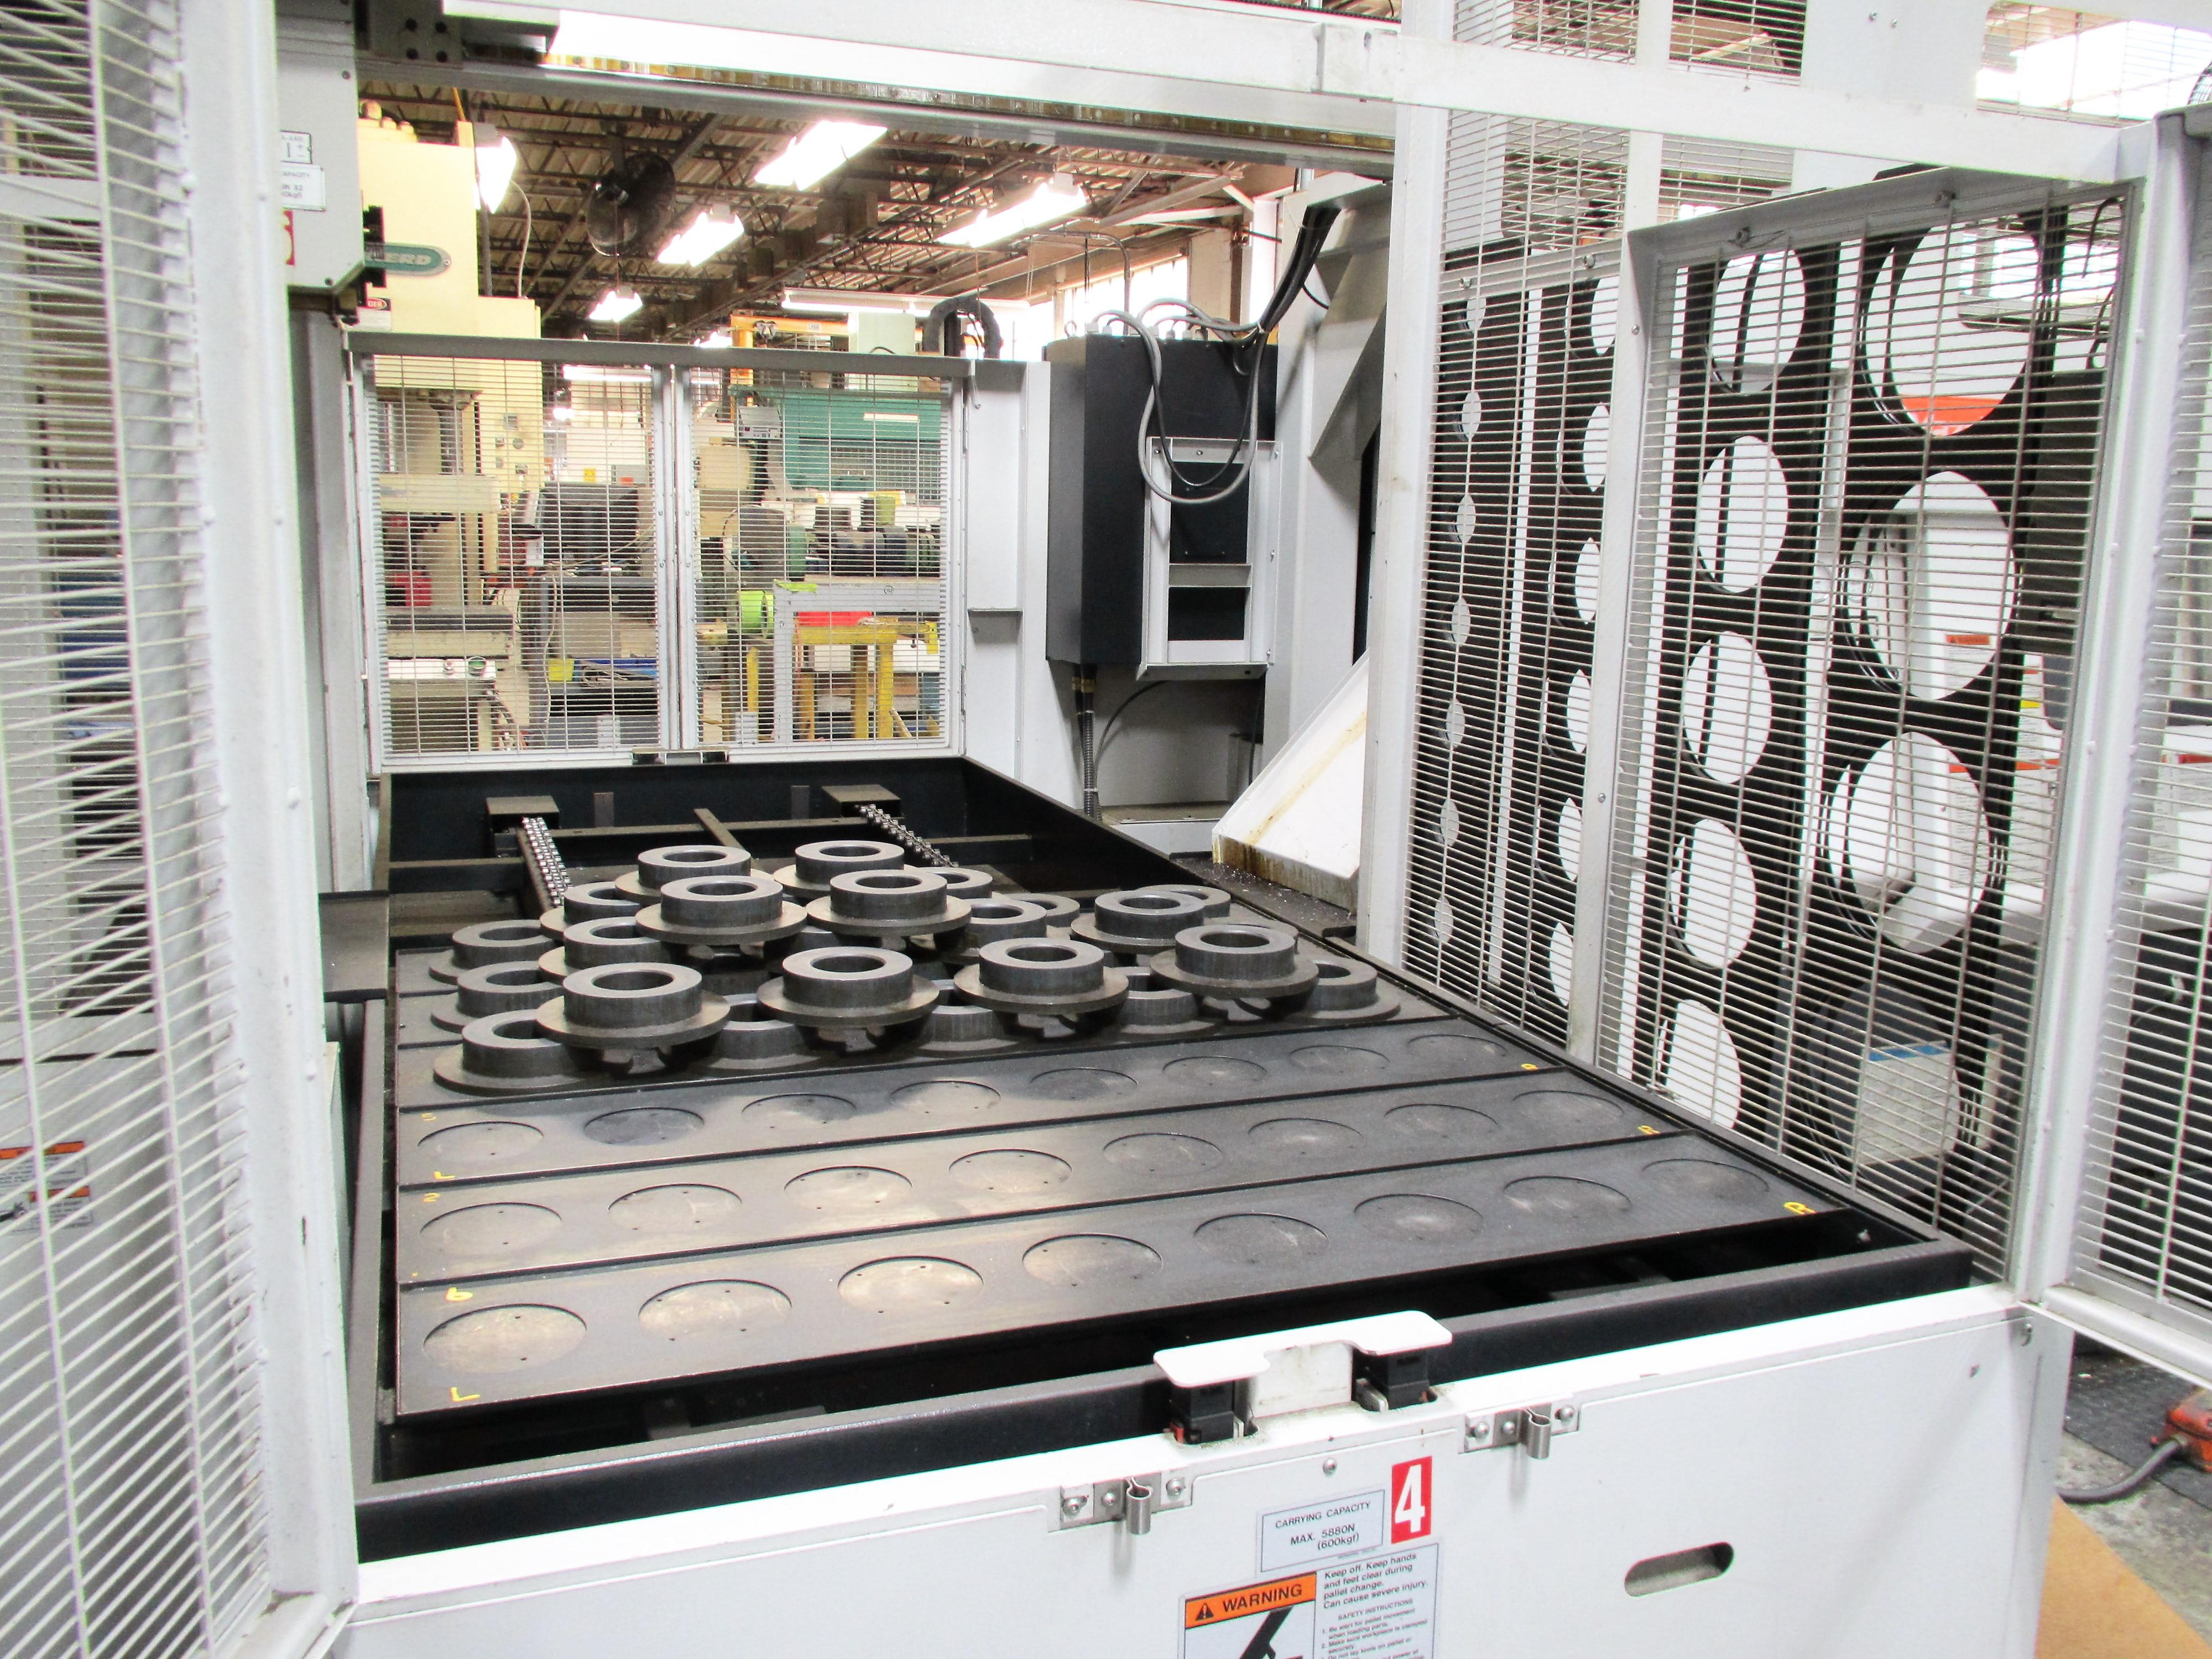 MAZAK QUICK TURN NEXUS 250-II MSY CNC TURNING CENTER - Image 12 of 16